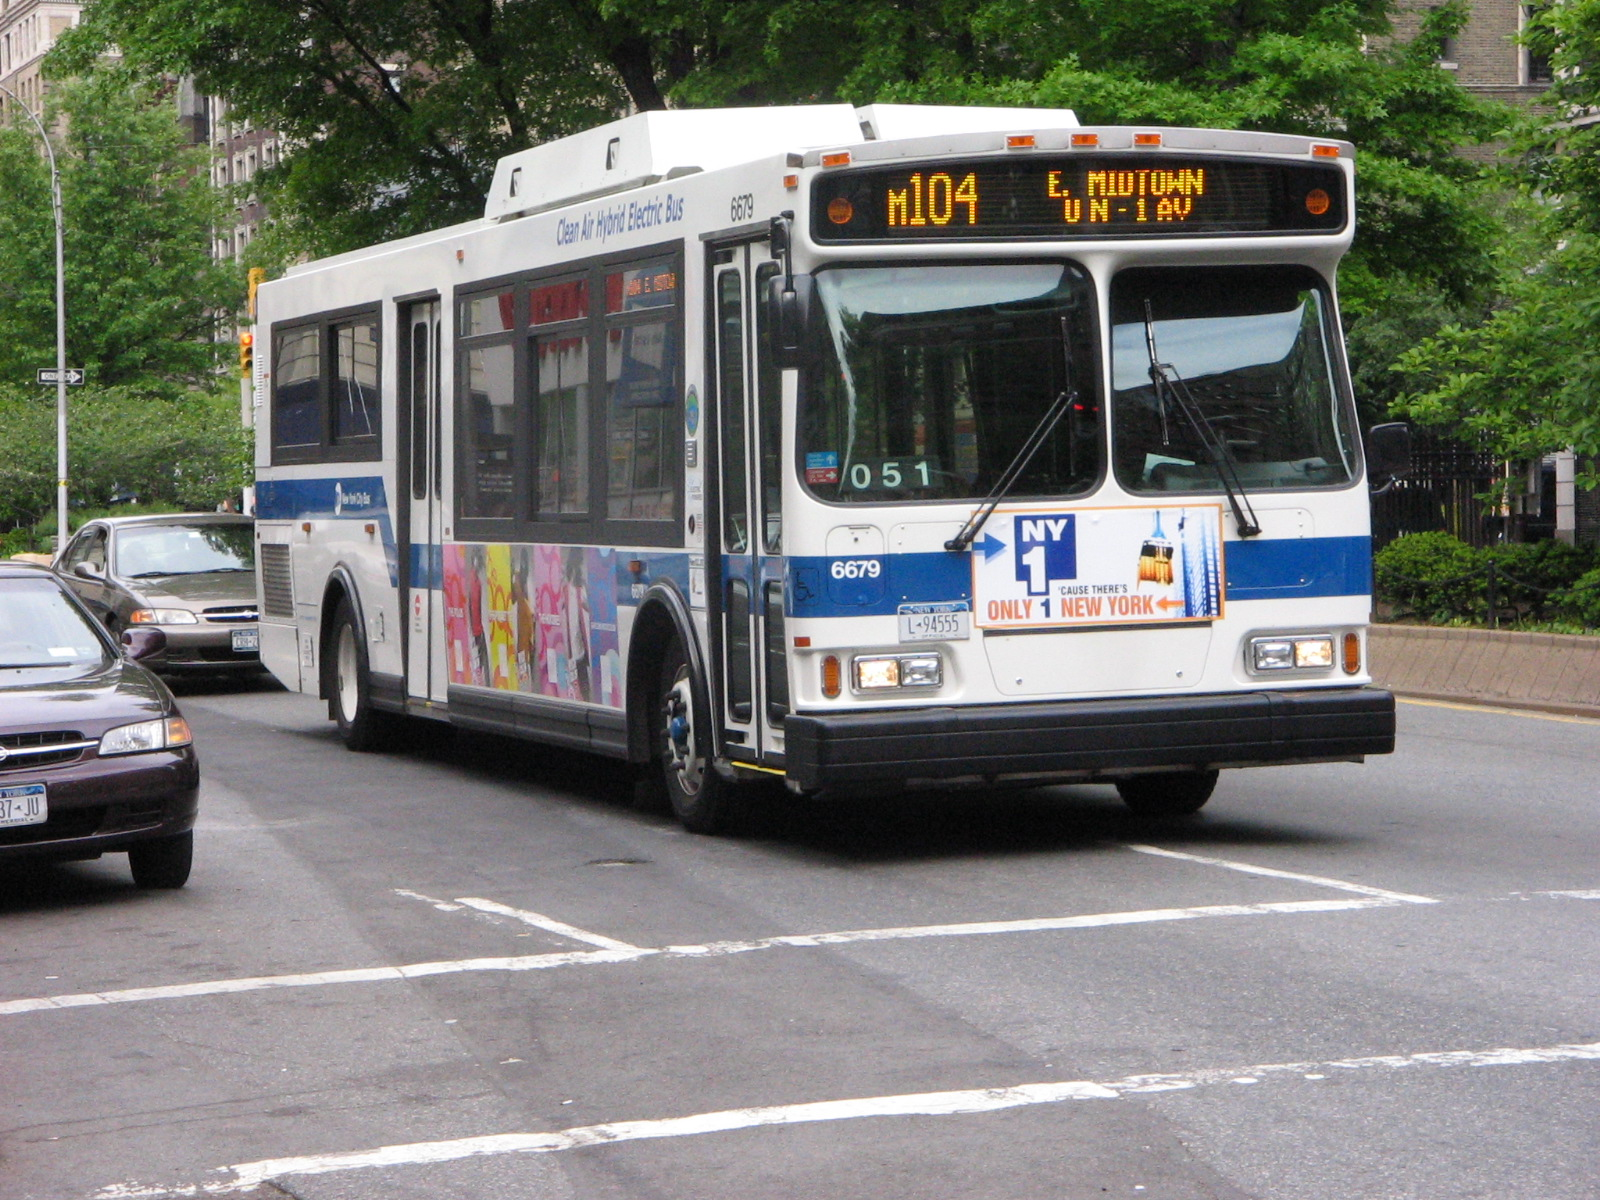 MTA_NYCT_Orion_VII_HEV_6679.jpg